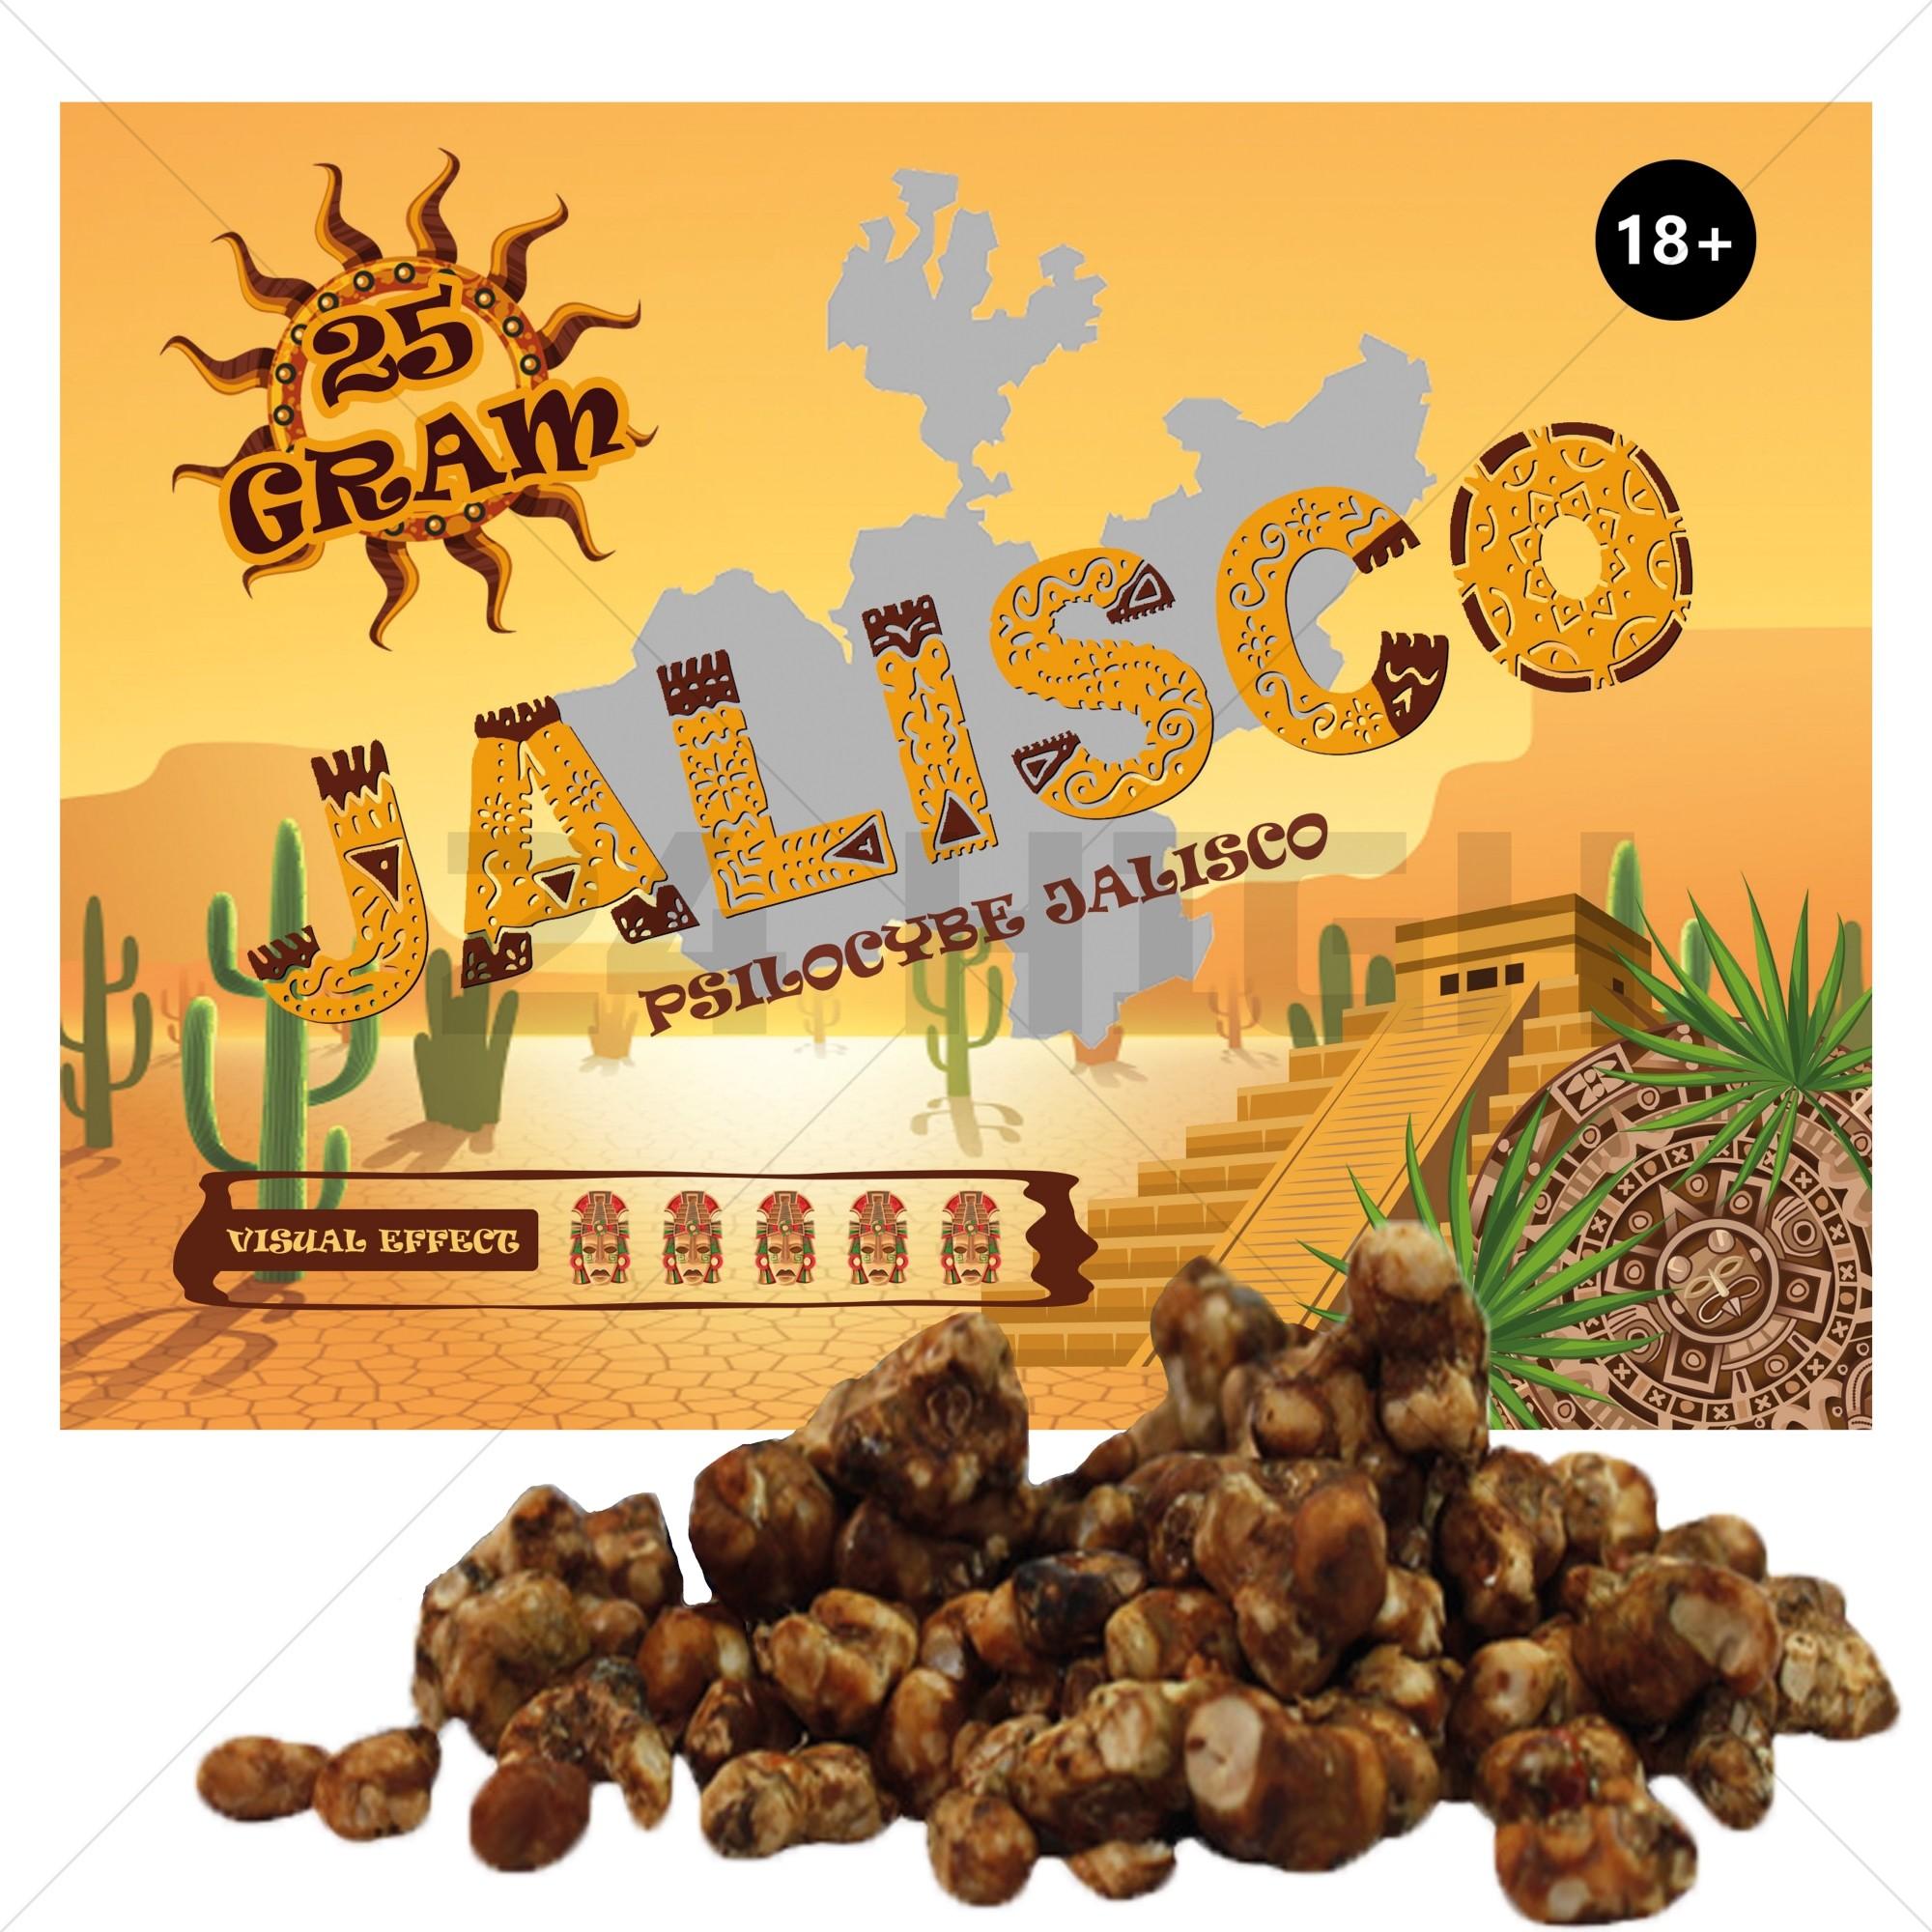 Psilocybe Jalisco Truffels